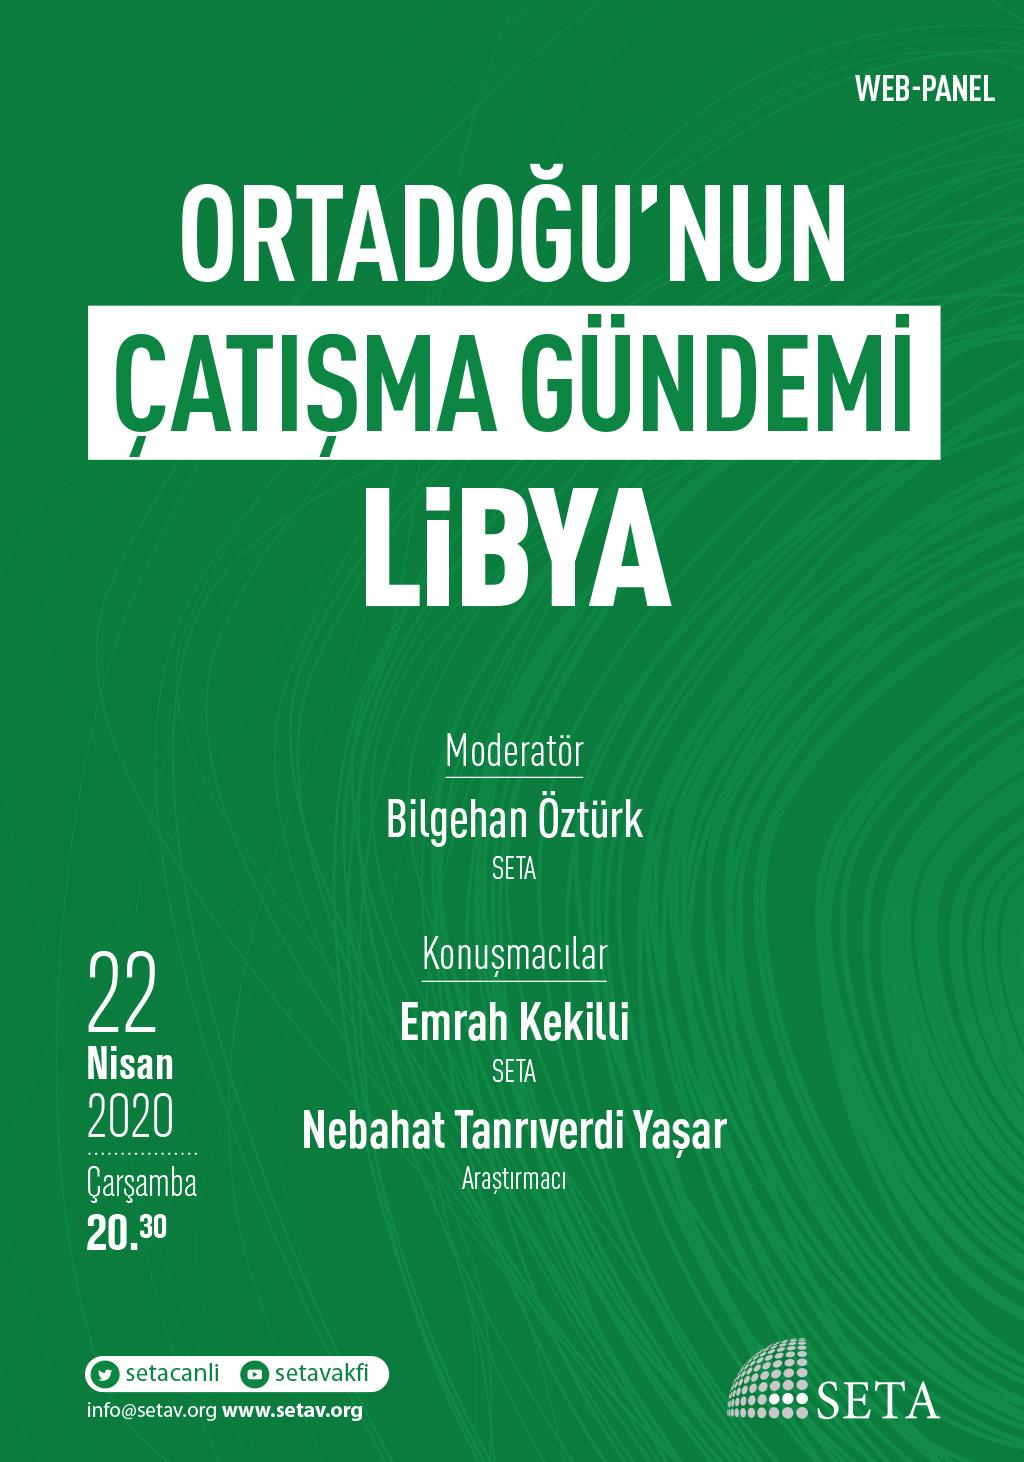 Web Panel: Ortadoğu'nun Çatışma Gündemi   Libya